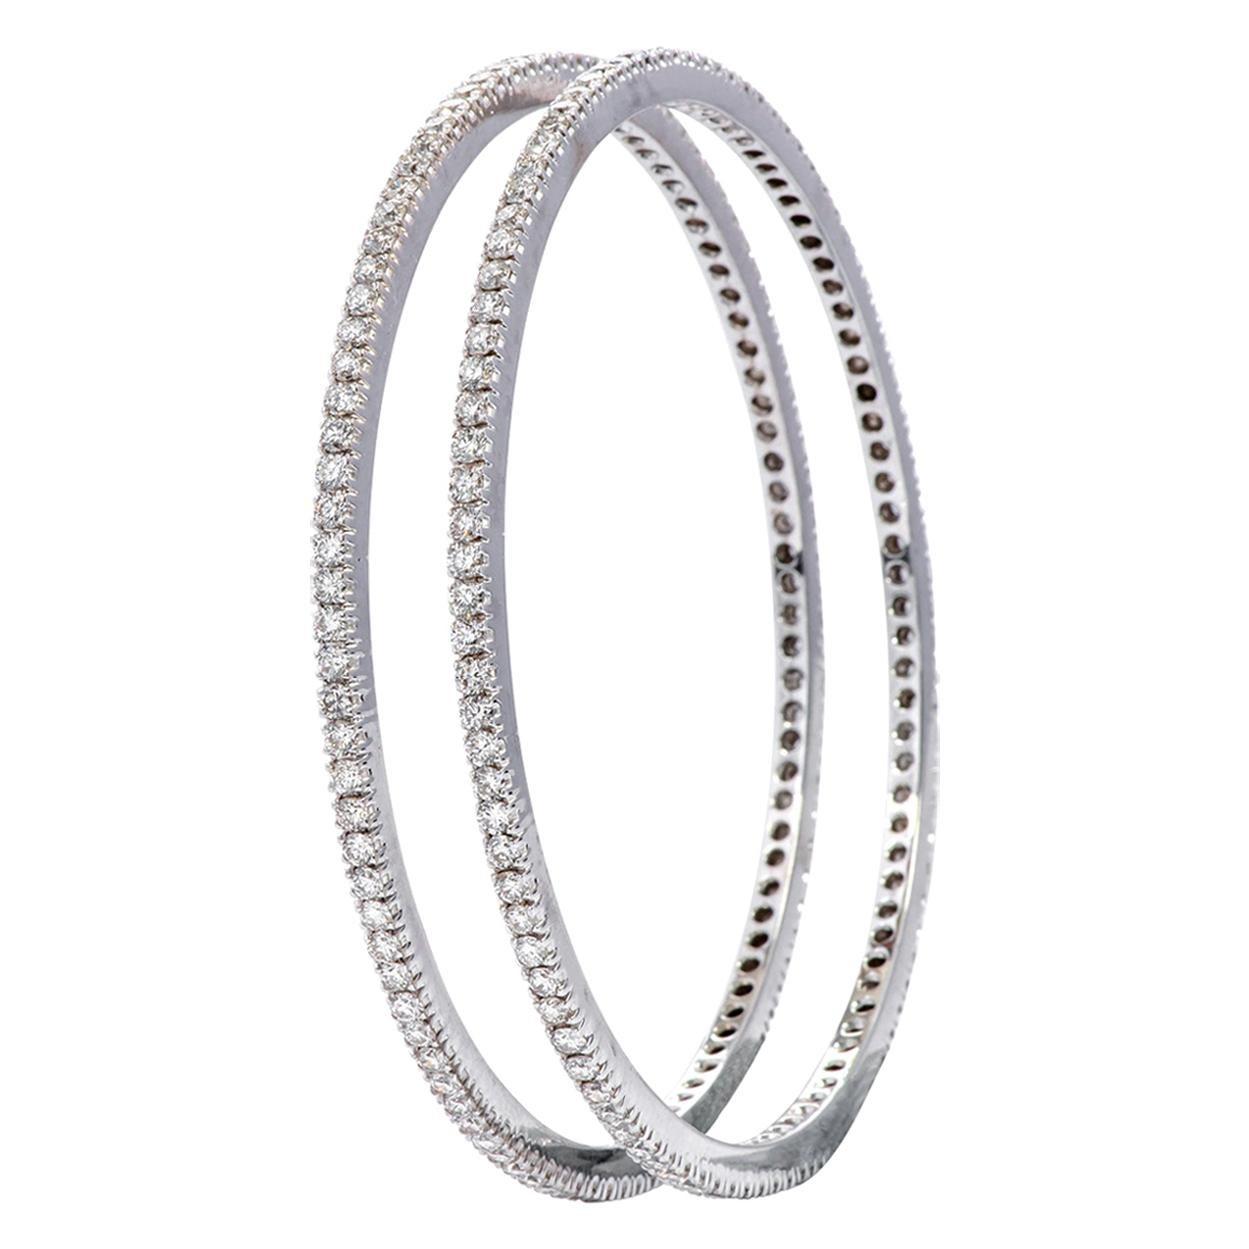 18 Karat White Gold 3.00 Carat Diamond Brilliant-Cut Tennis Bangle Bracelet